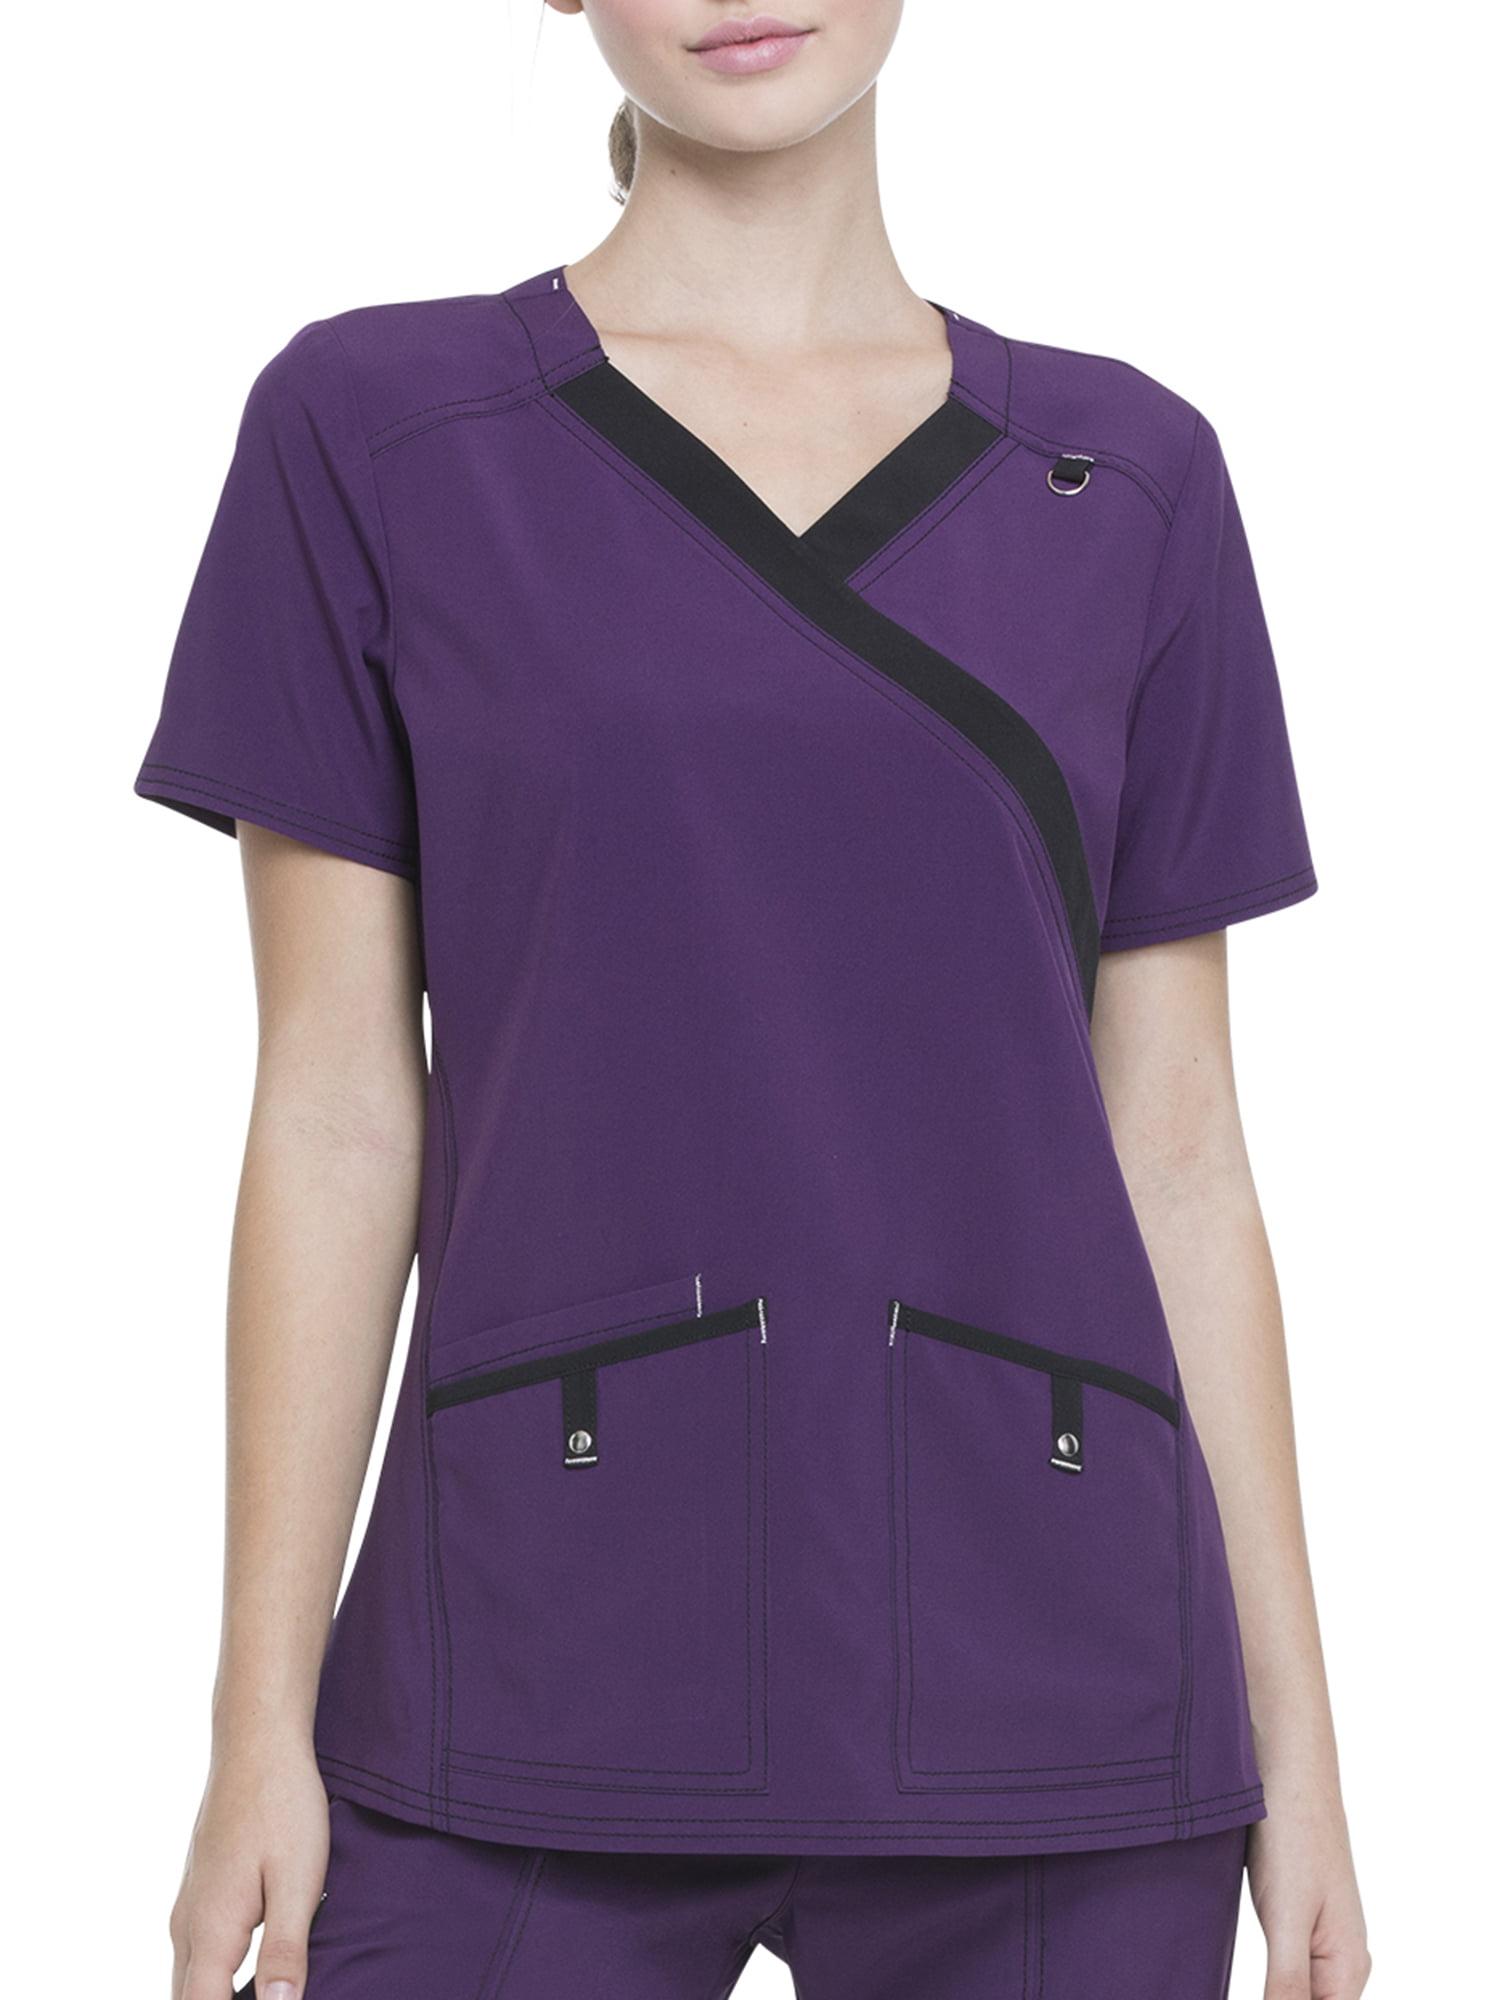 a93a18ce747 Scrubstar Women's Fashion Collection 4-Way Stretch Scrub Top ...